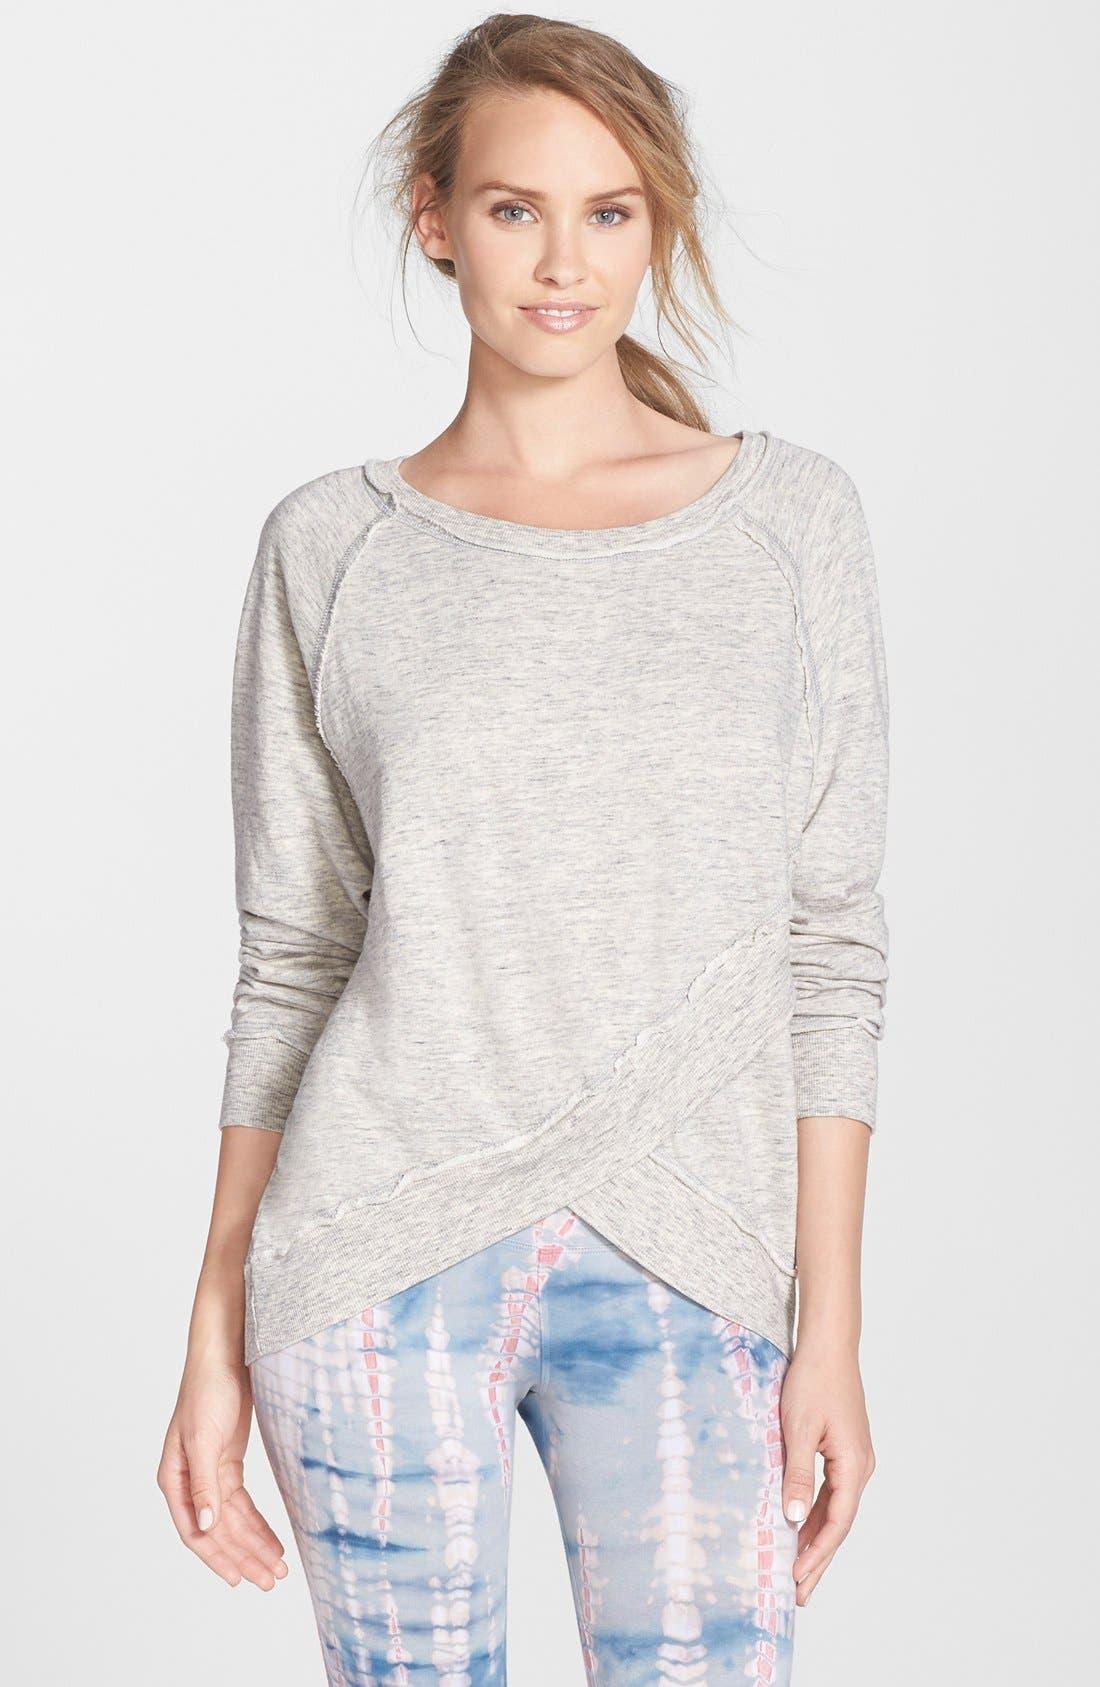 Alternate Image 1 Selected - Hard Tail Crossover Sweatshirt